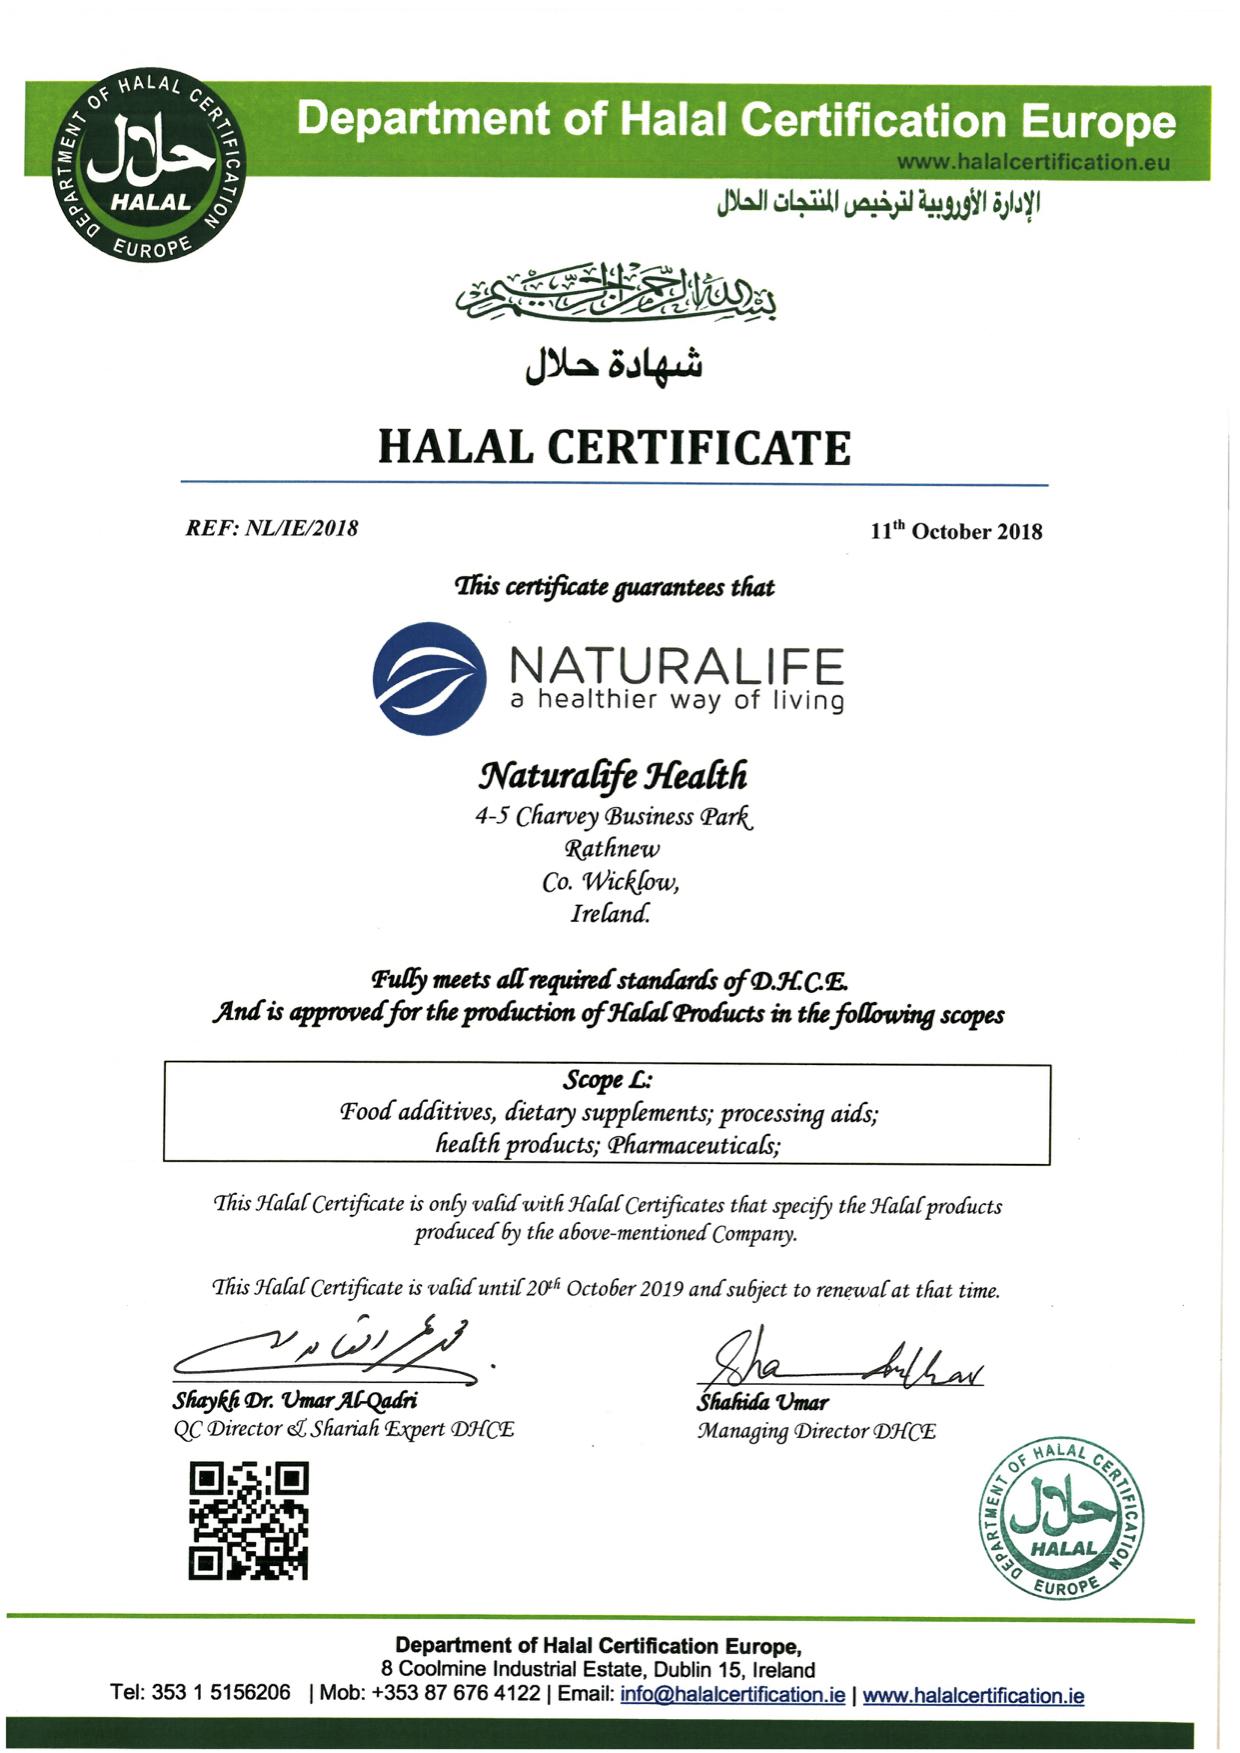 Uncategorized – Page 3 – Department of Halal Certification EU